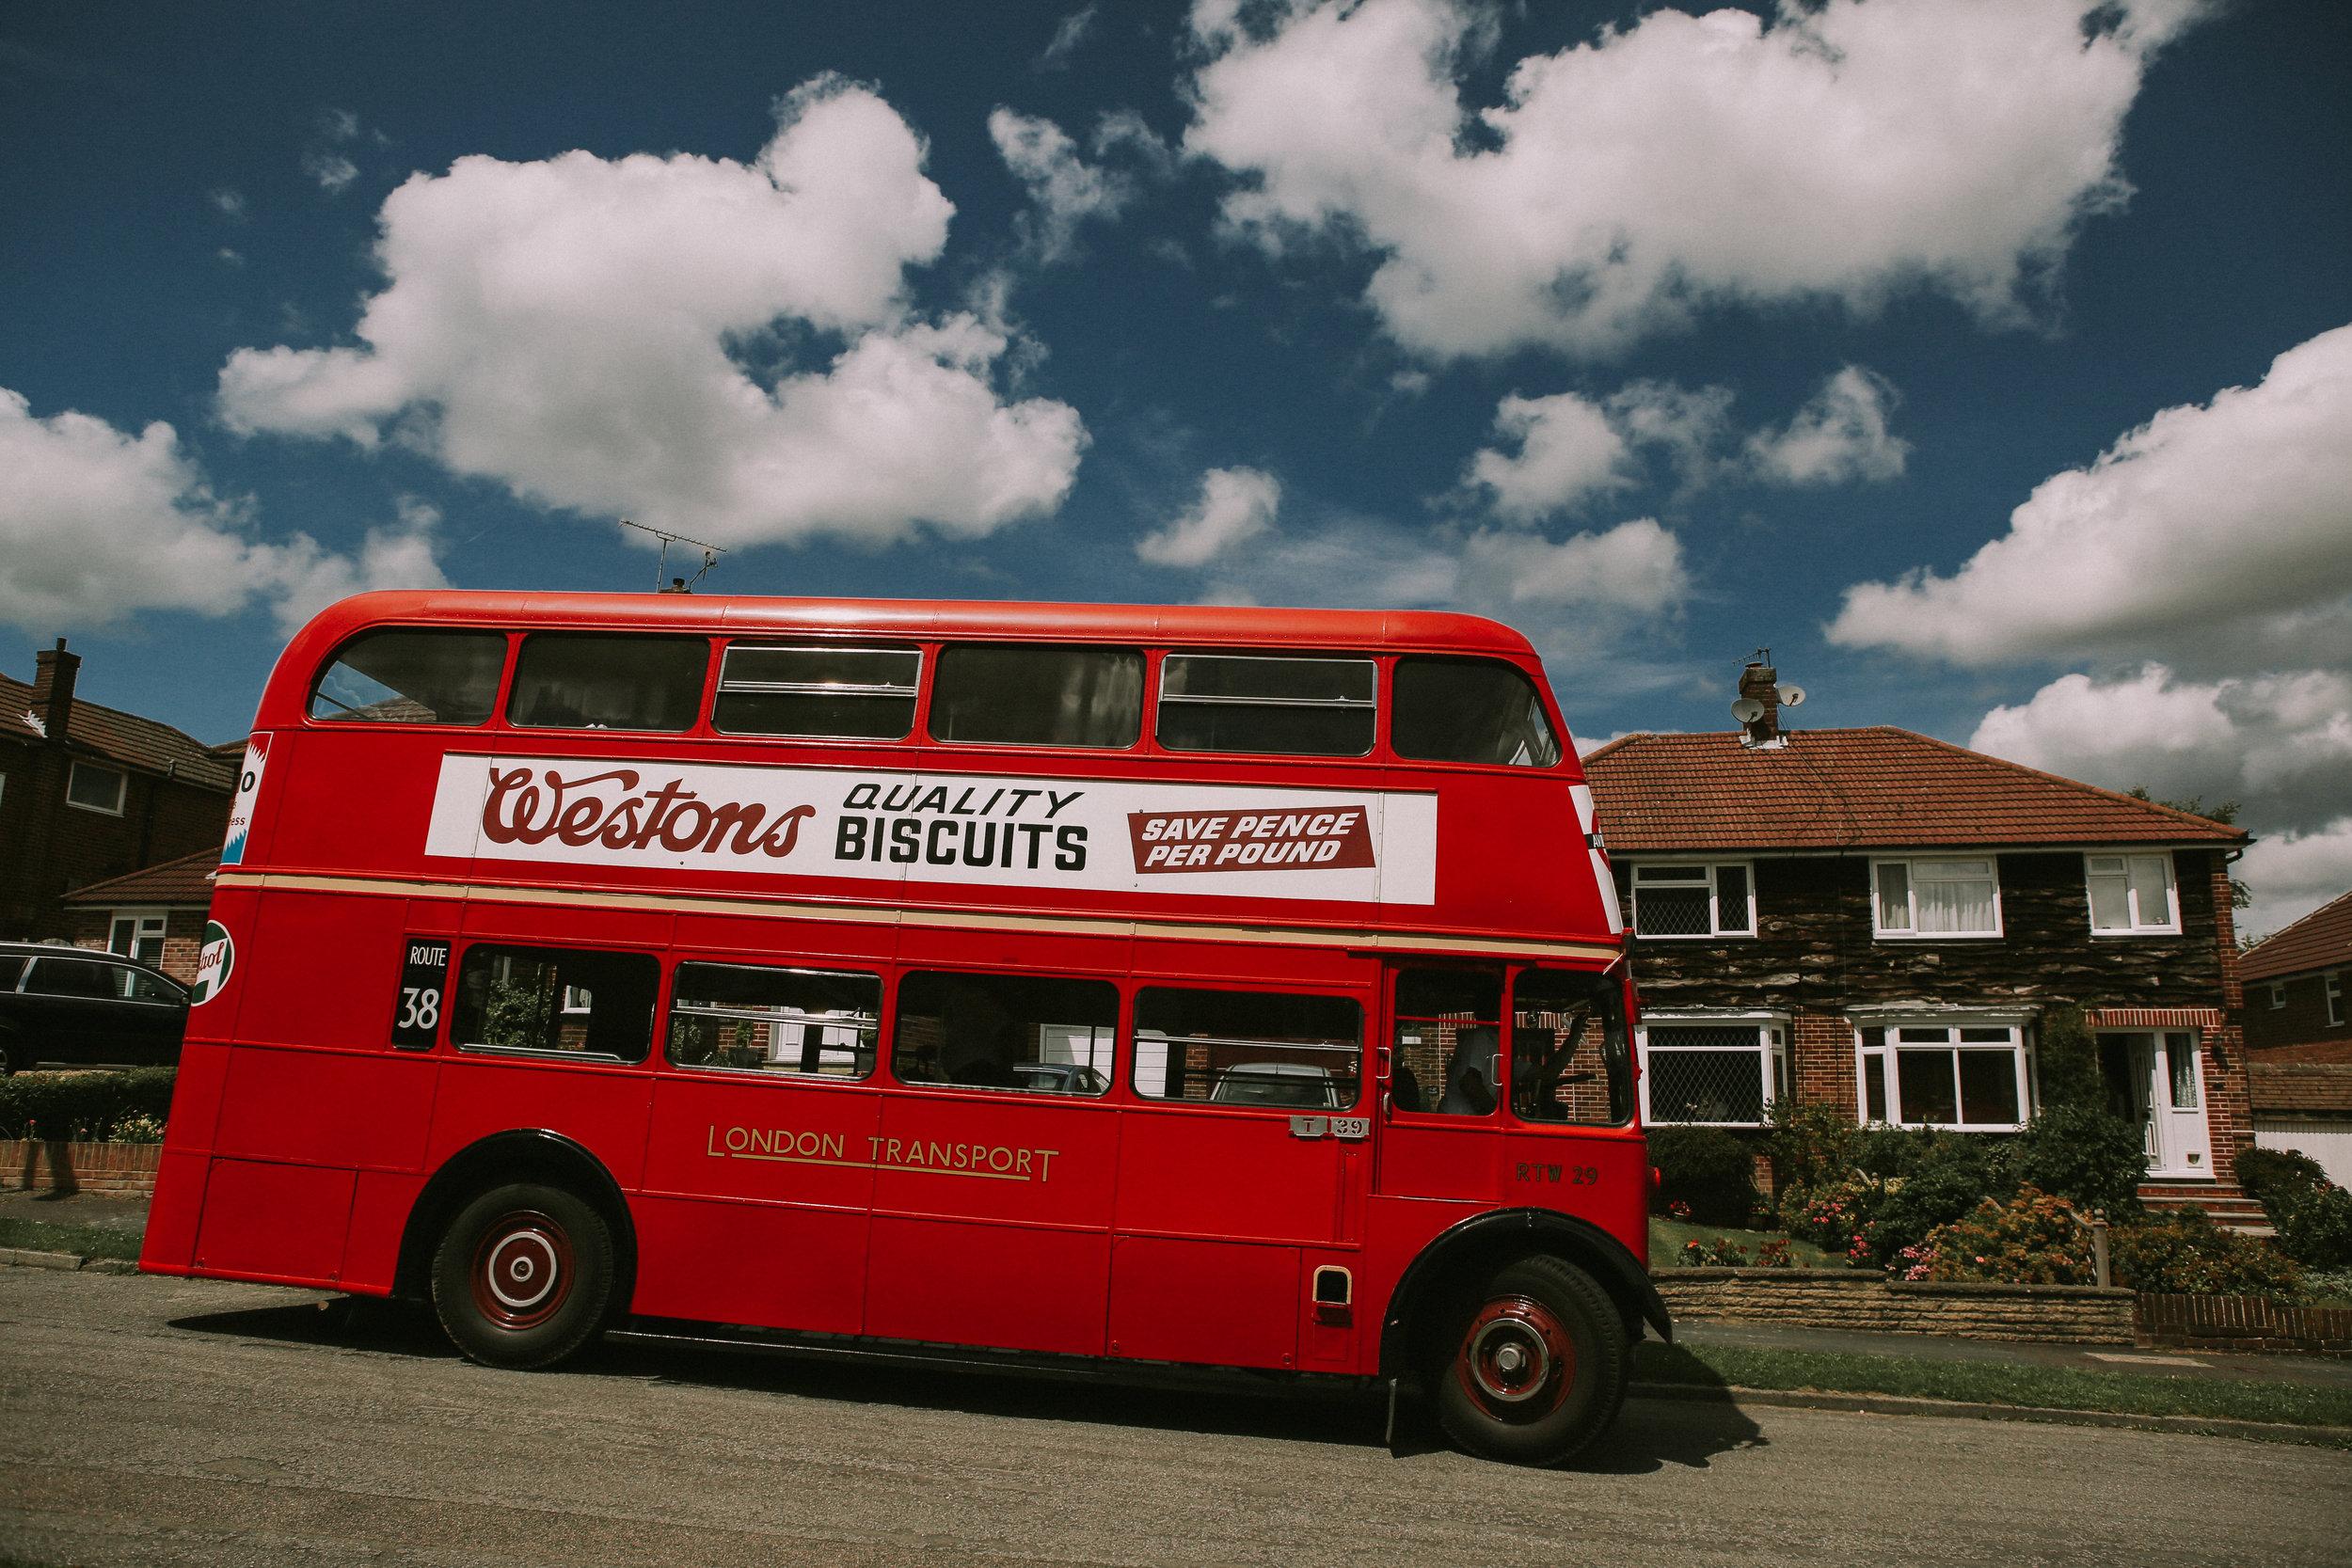 reigate-surrey-london-wedding-photography-bridal-prep-routemaster-bus-19